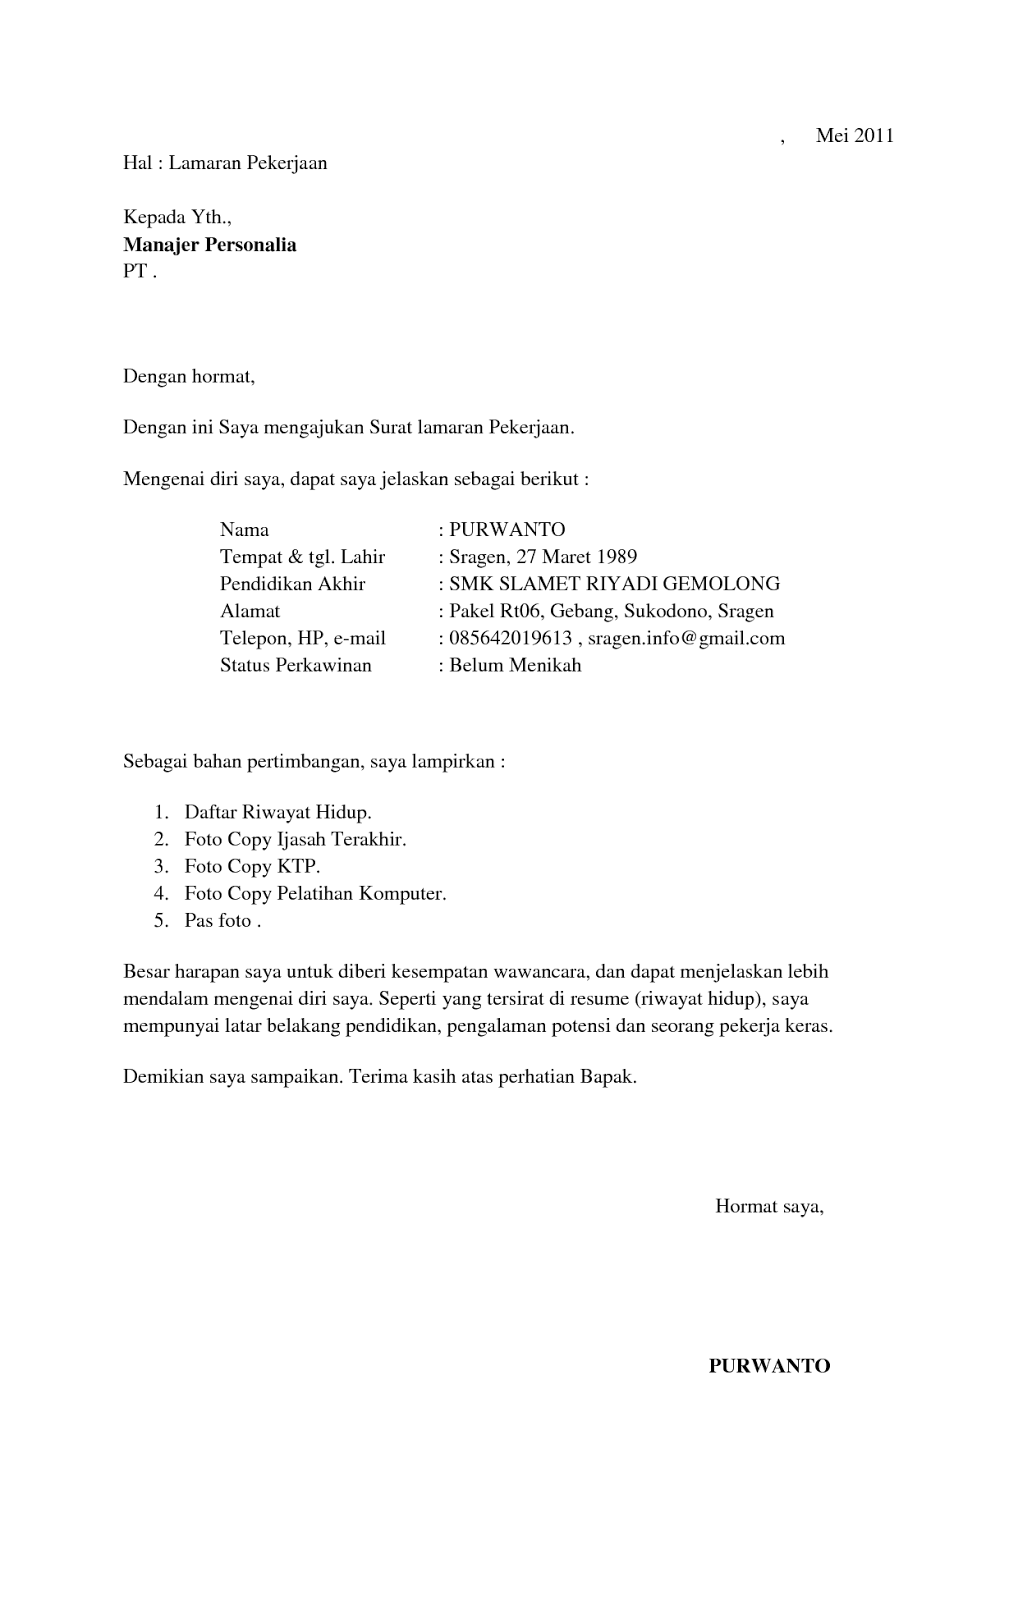 Contoh Surat Lamaran Kerja Di Garment Terbaru Susan Jobs